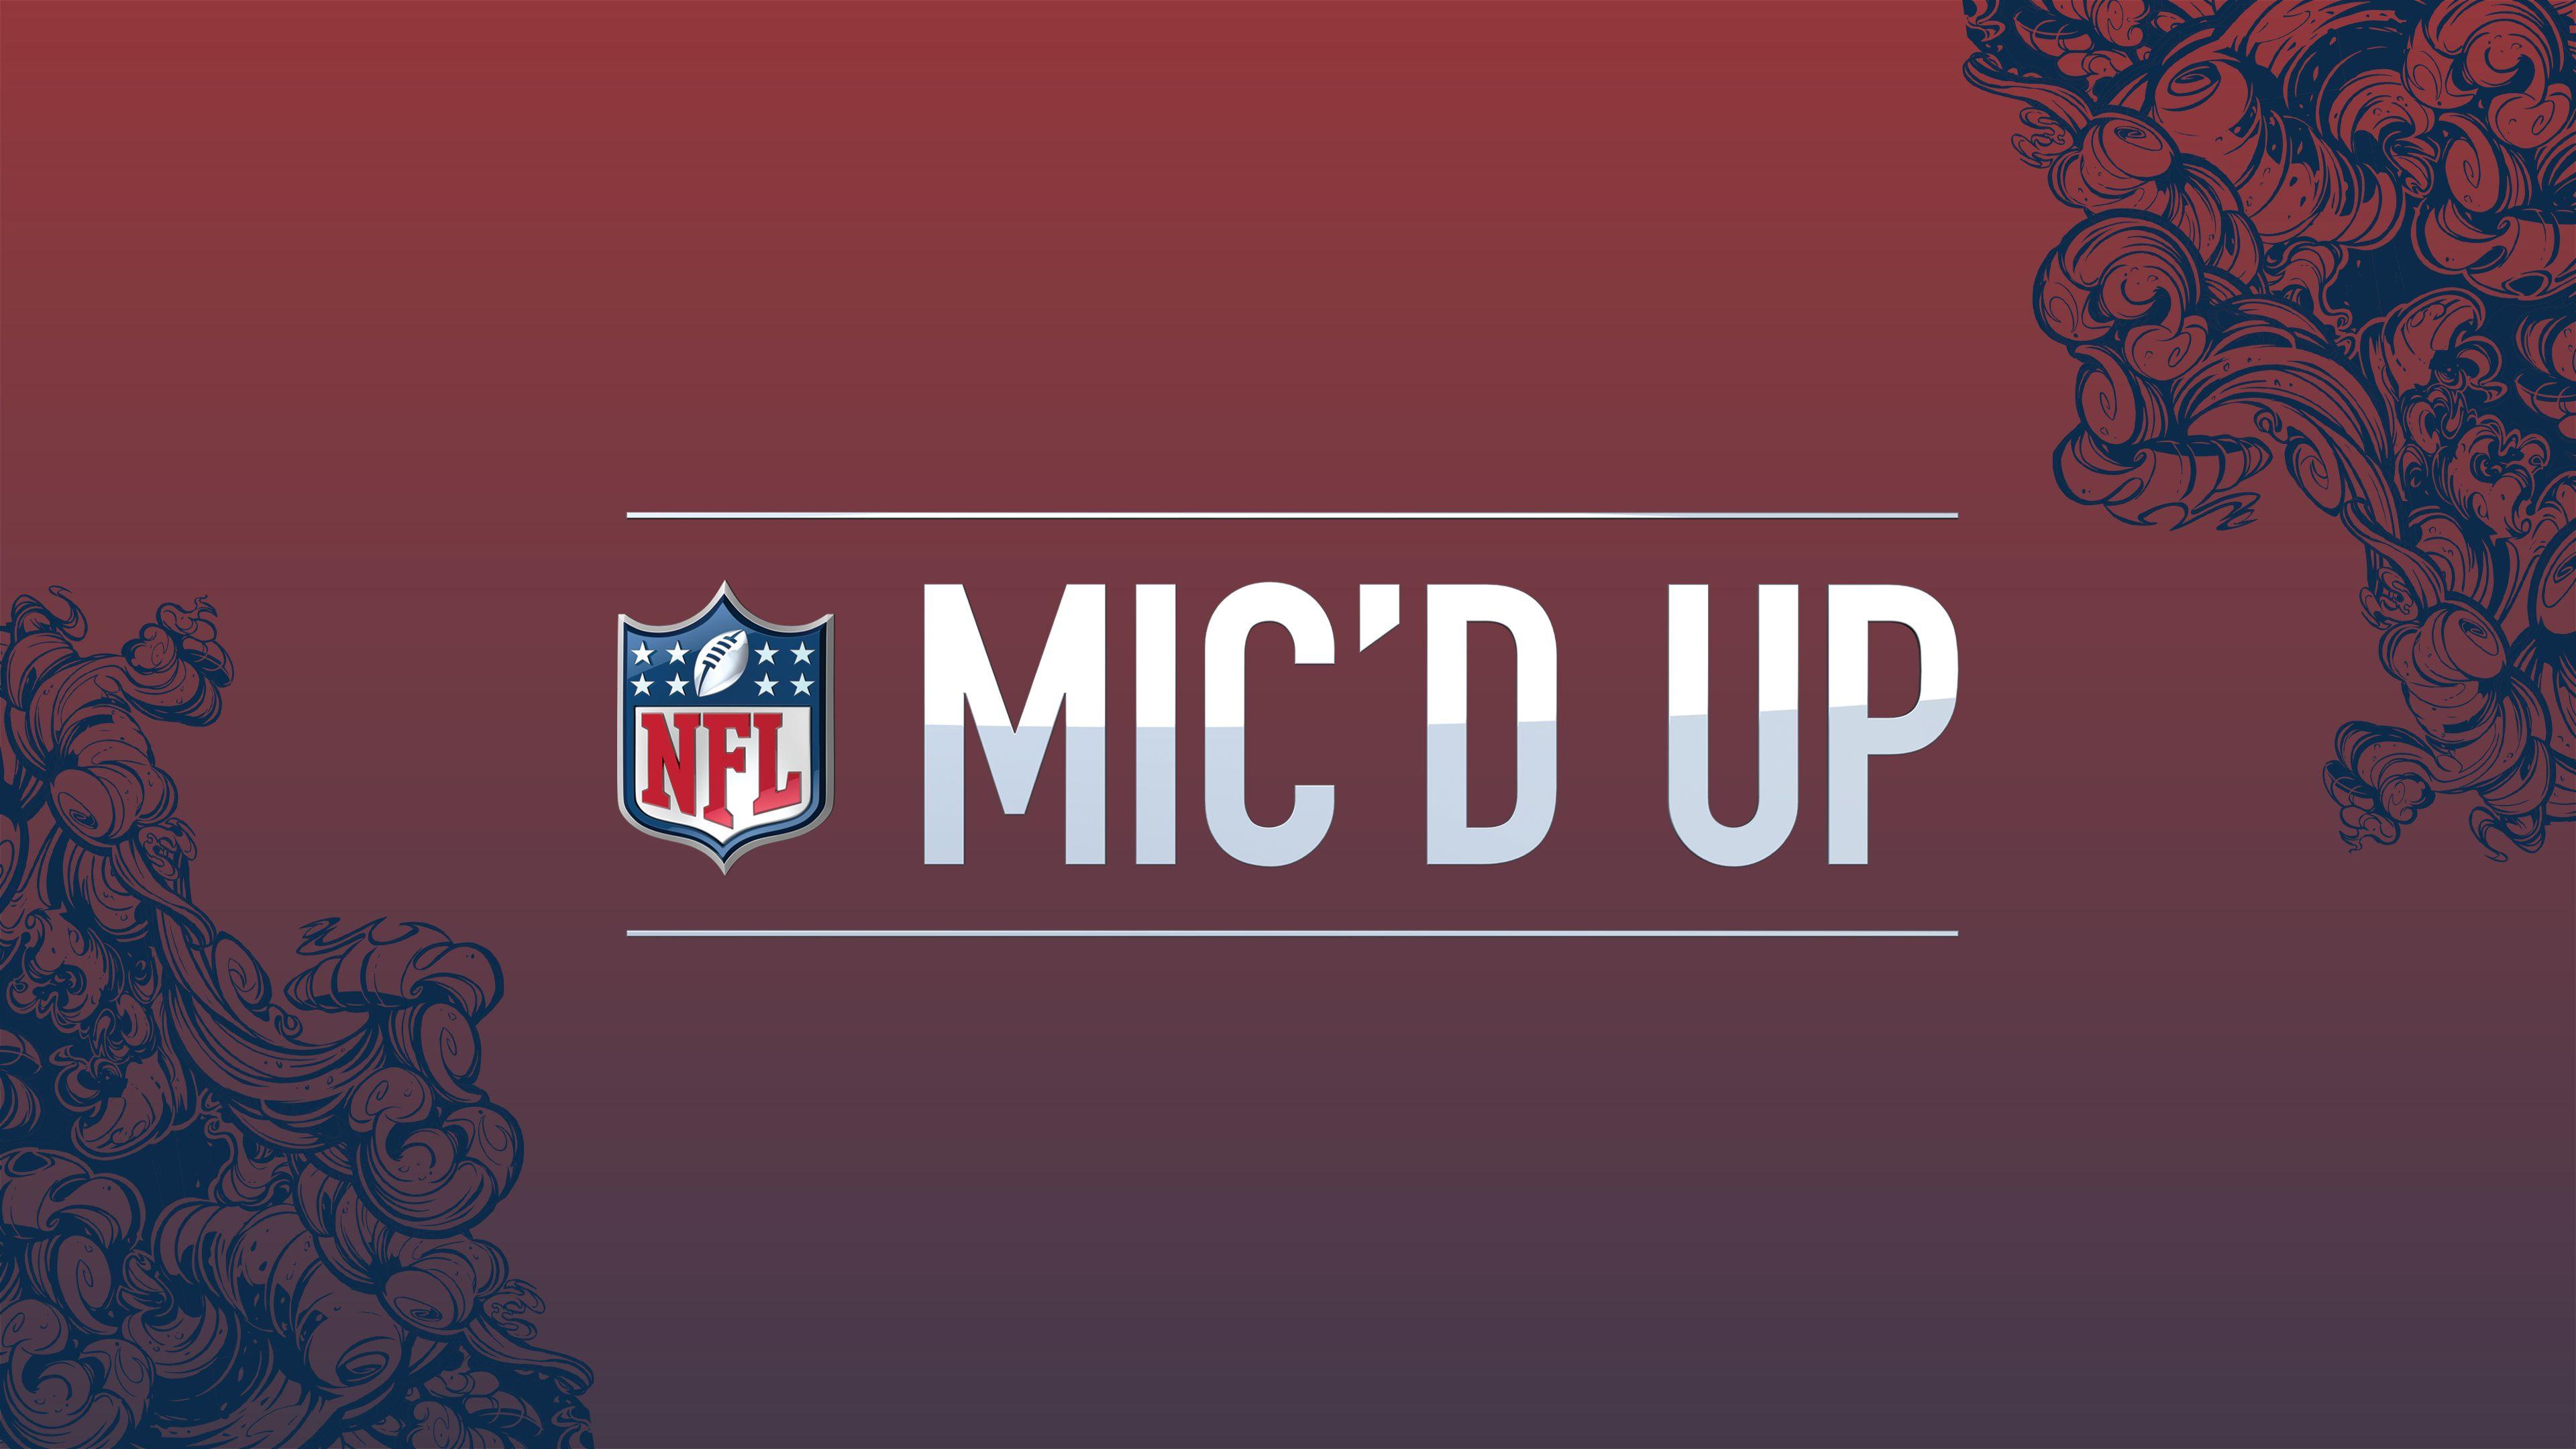 NFL Mic'd Up: Best of 2020